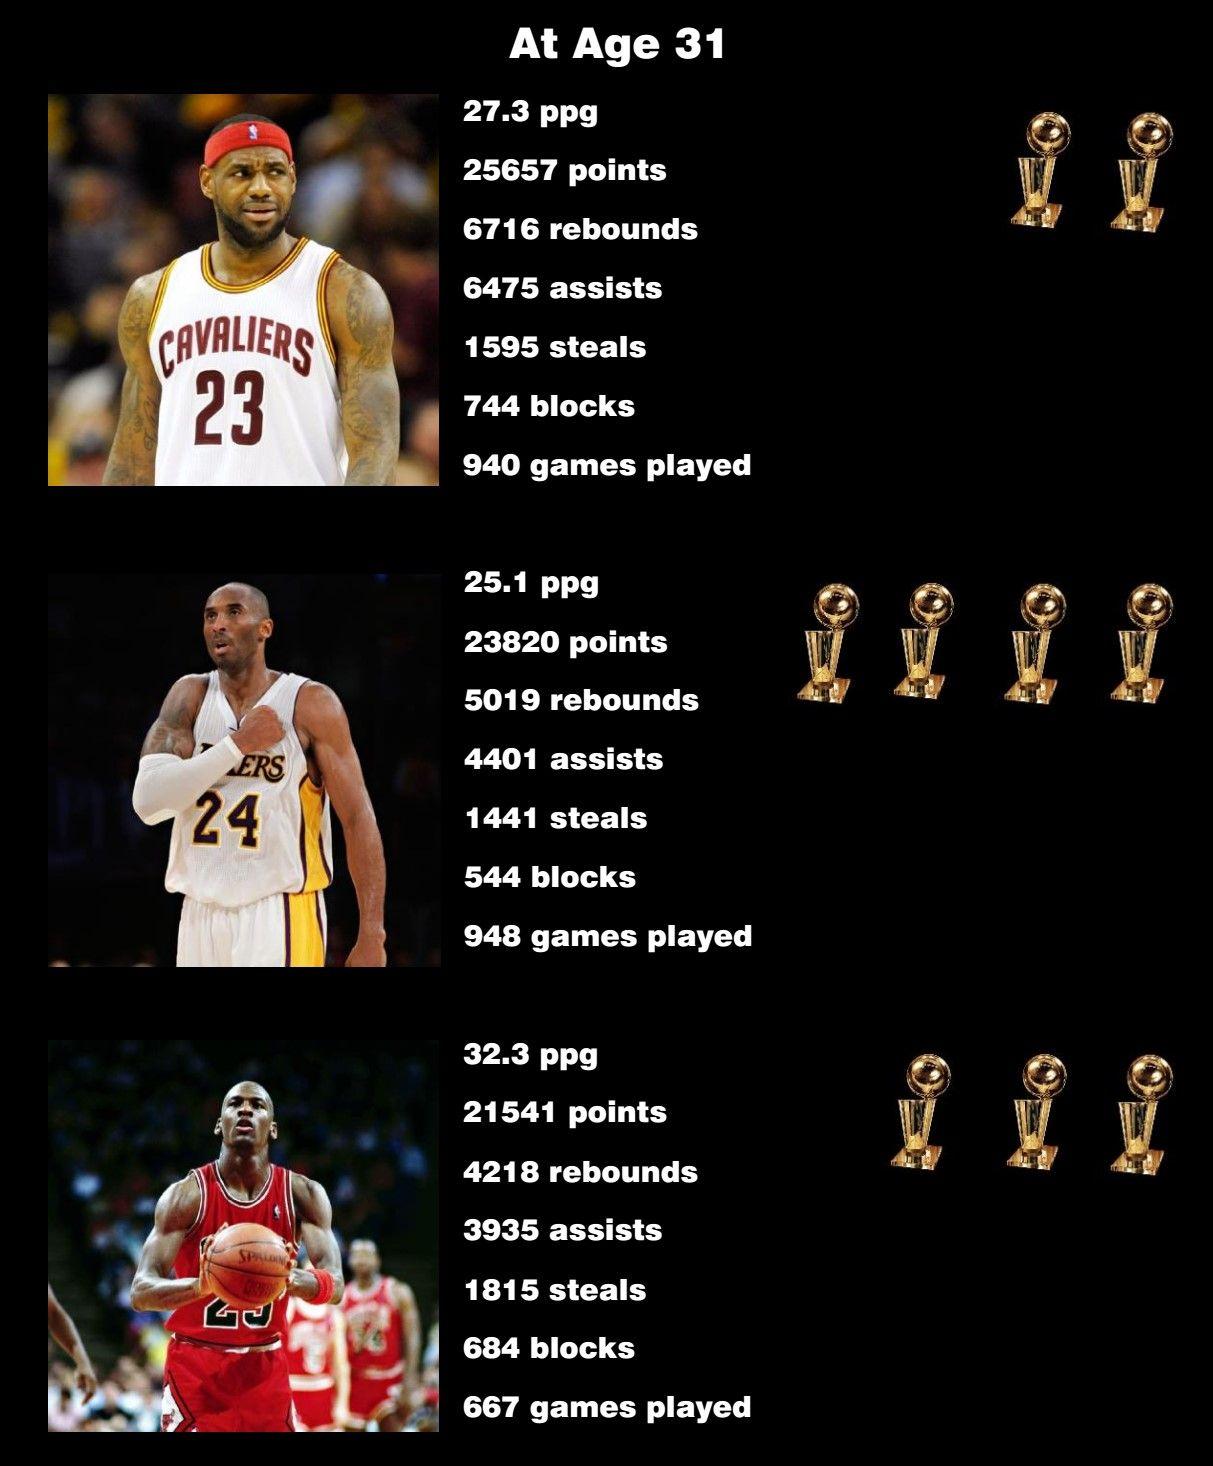 9ca8ed5d286c Comparison Lebron James   Kobe Bryant   Michael Jordna at Age 31  nba   stats  lebronjames  kobebryant  michaeljordan  infographic